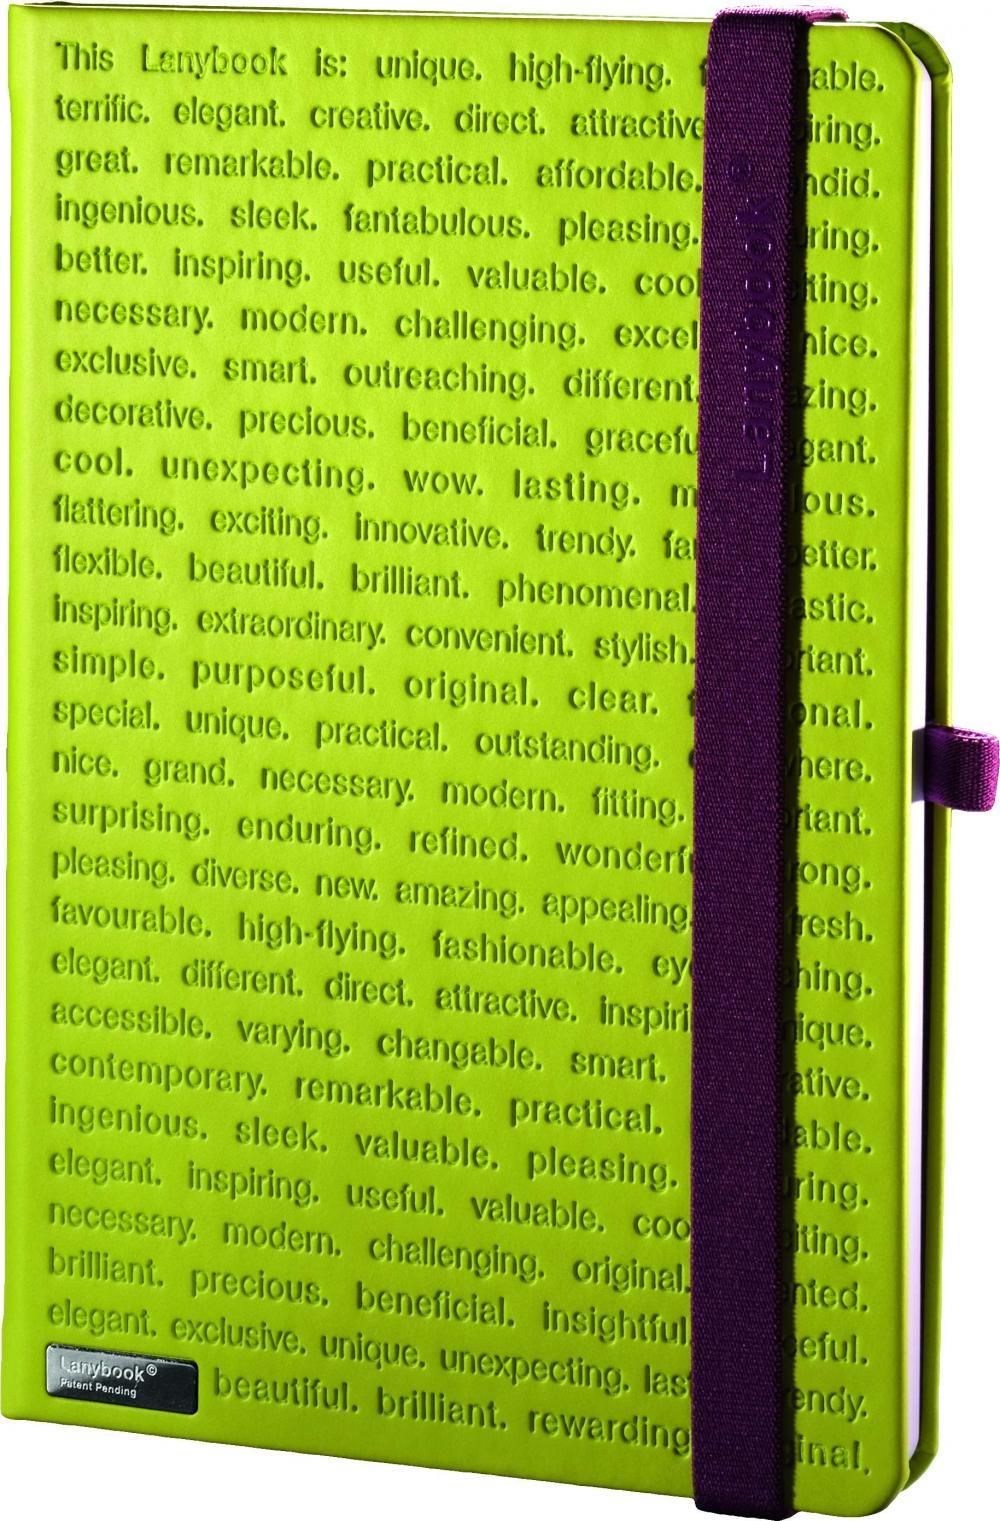 Agenda 17x25,The One 3,verde,dict